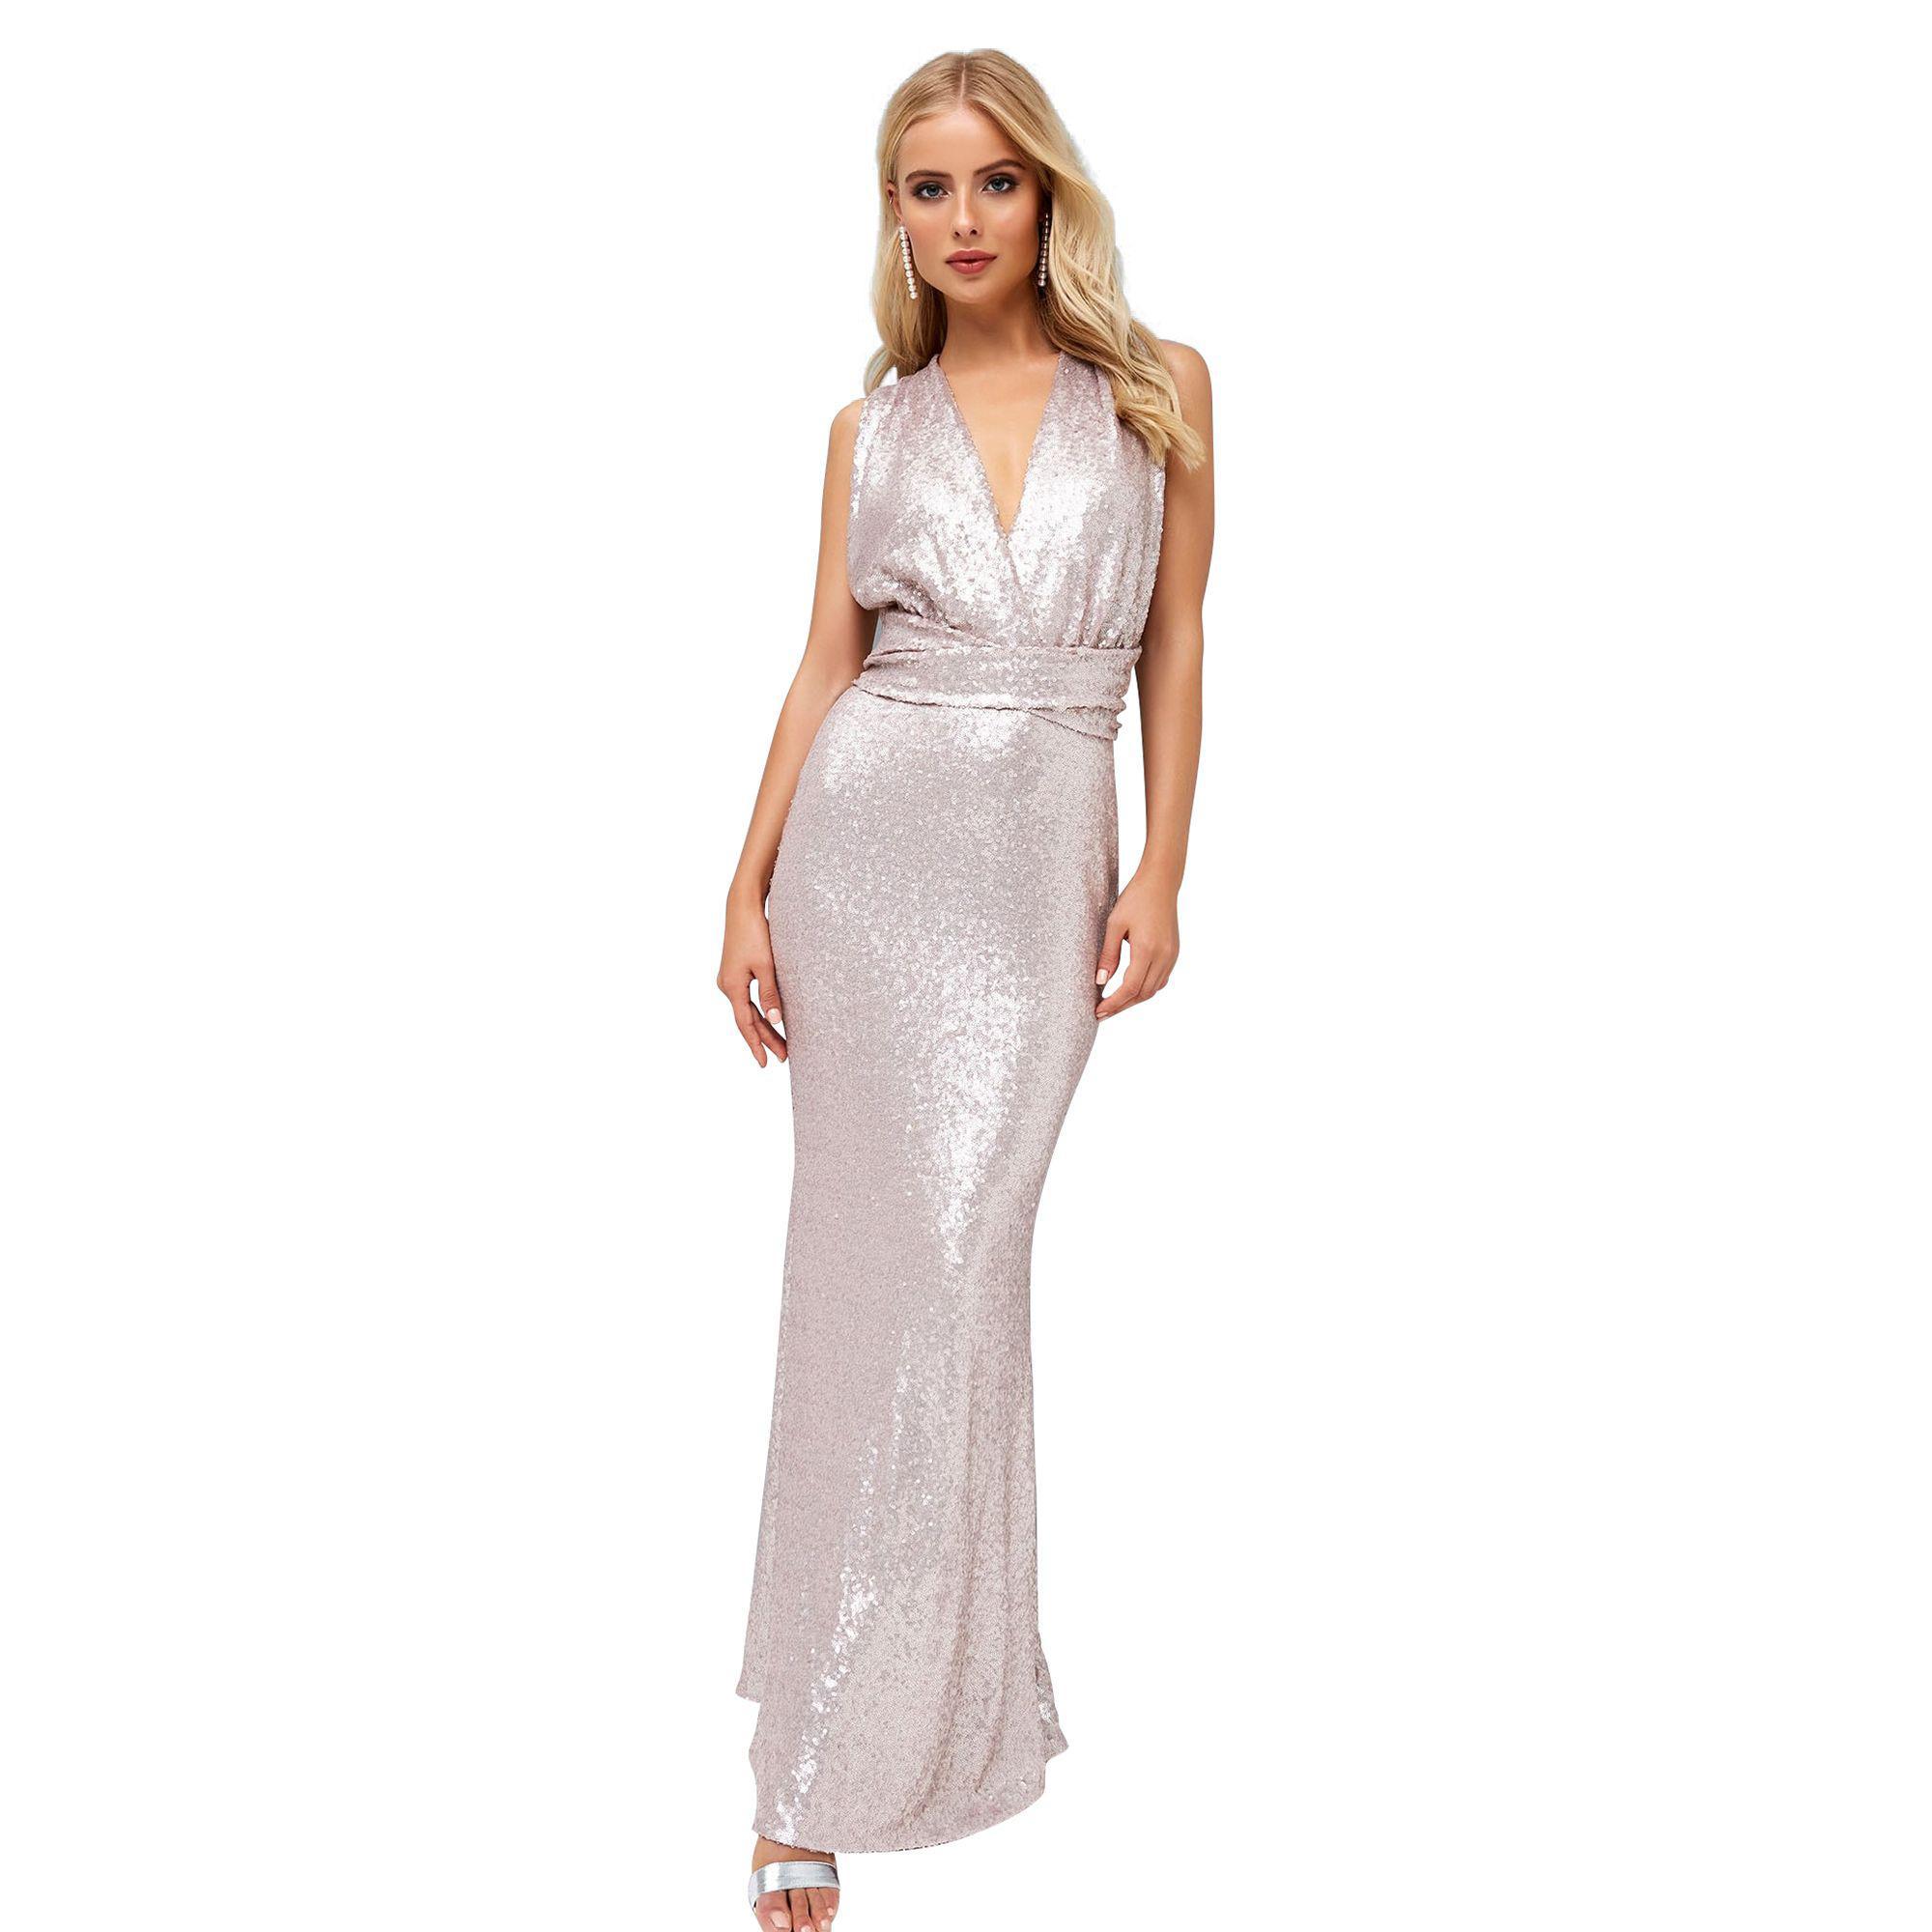 Bridesmaid Sequin Upper Maxi Dress With Tulle Tiered Skirt - Light pink Little Mistress nTjDKUk